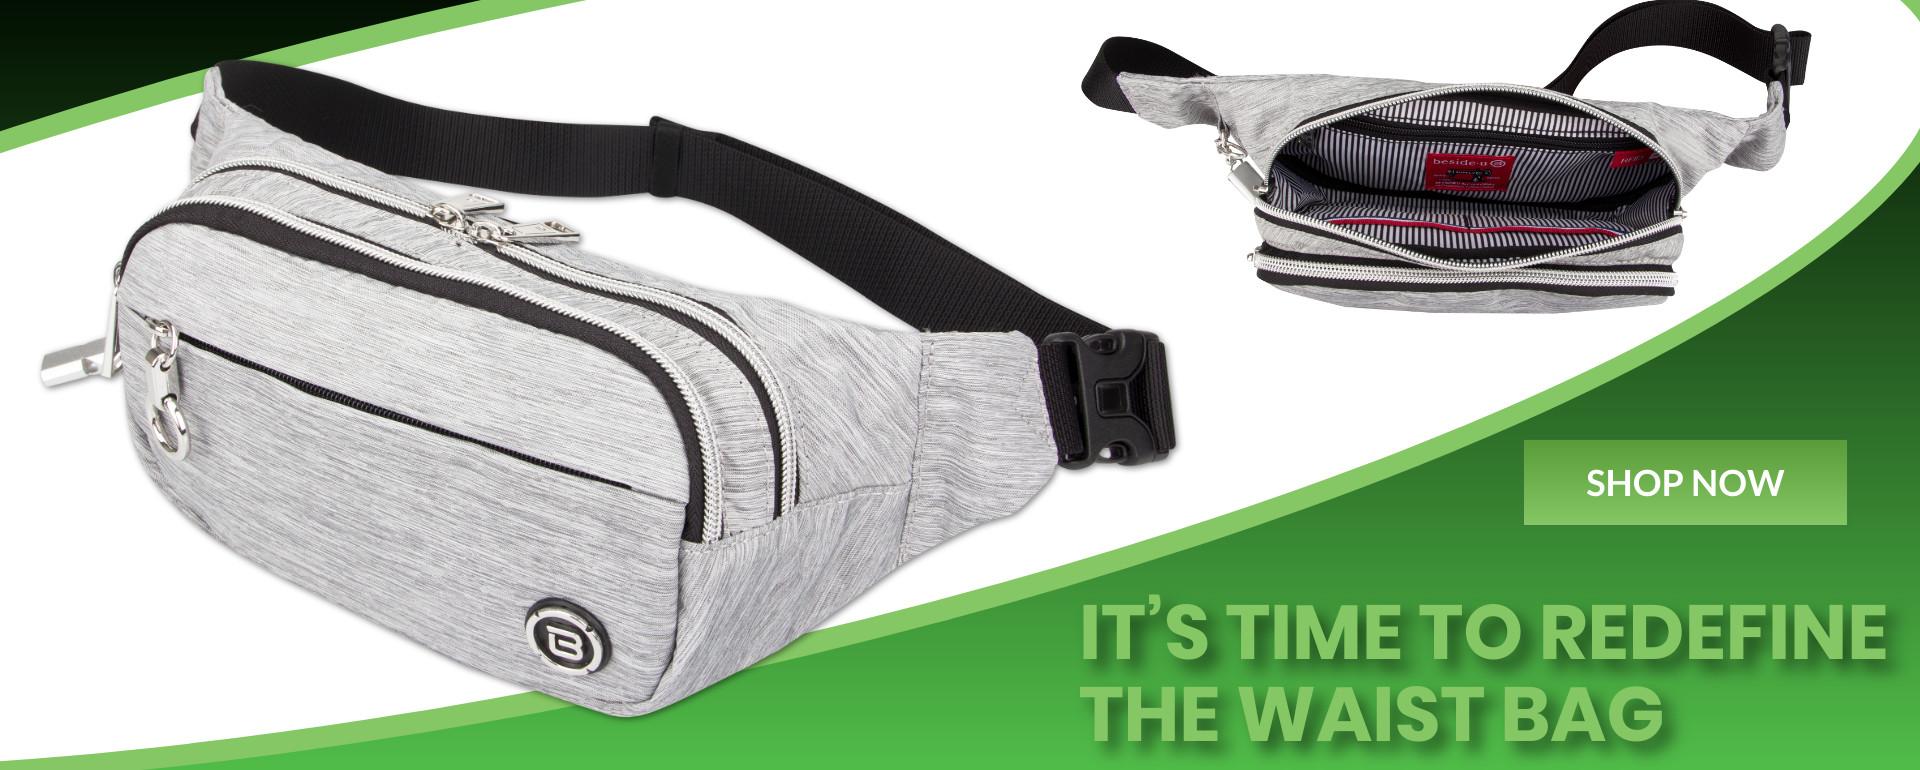 Ocean Gray waist bag purses fashion handbags designer bags green banner